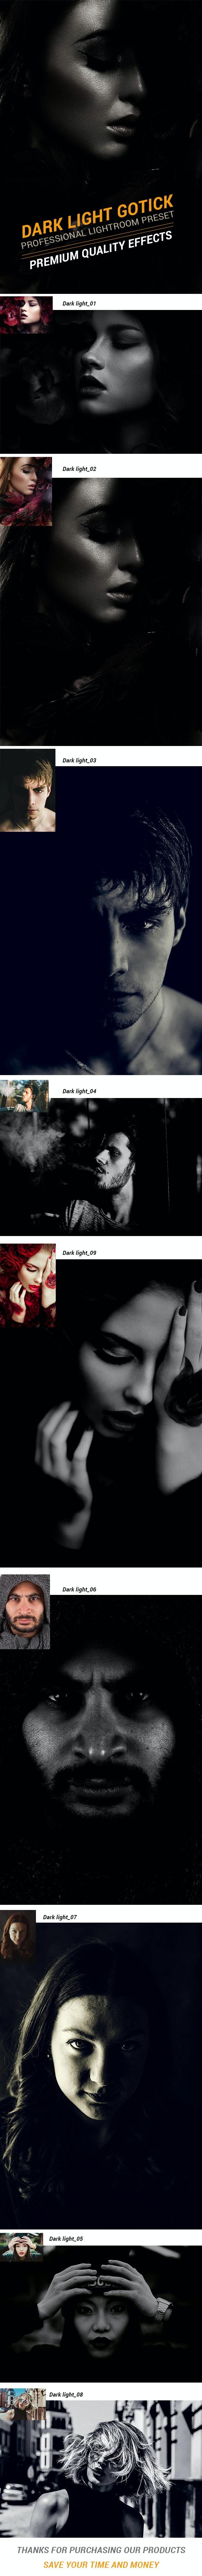 Dark Light Gothic Preset - Black and white Lightroom Presets